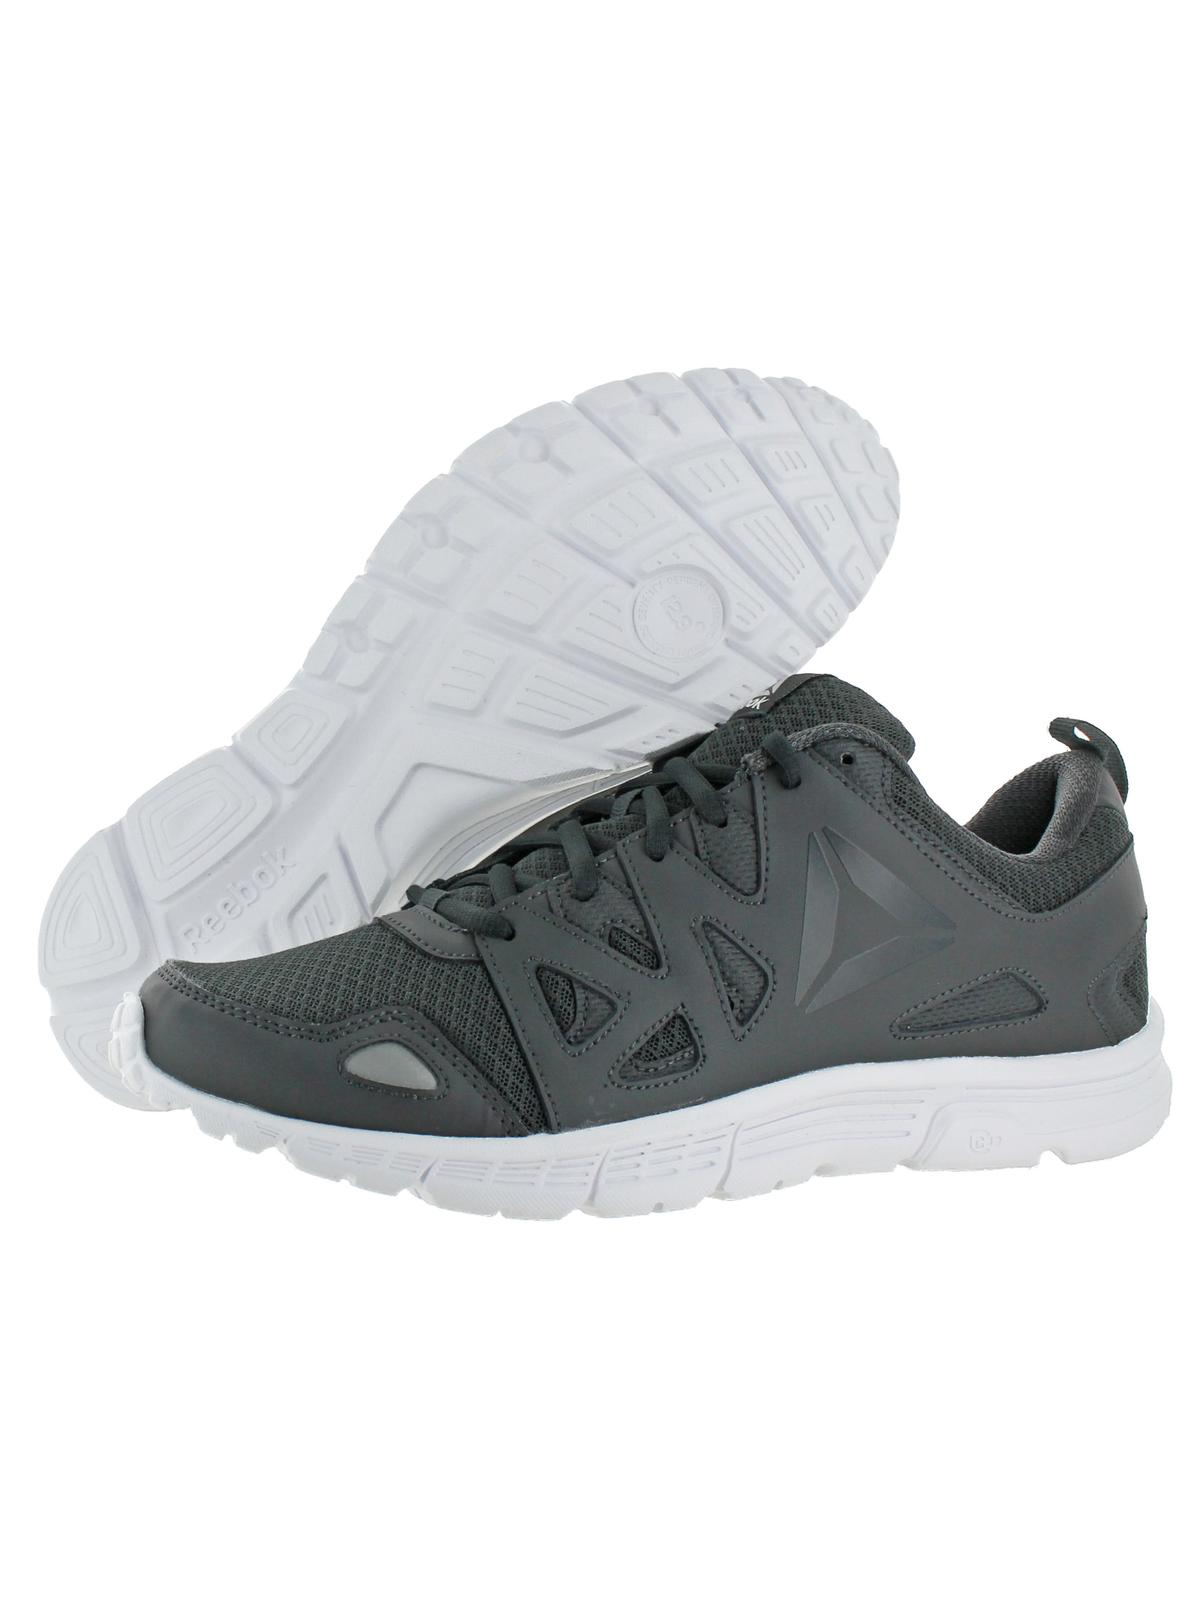 Reebok Men's Run Supreme 3.0 Mt Coal / Ash Grey Silver White Ankle-High Running Shoe - 9.5M